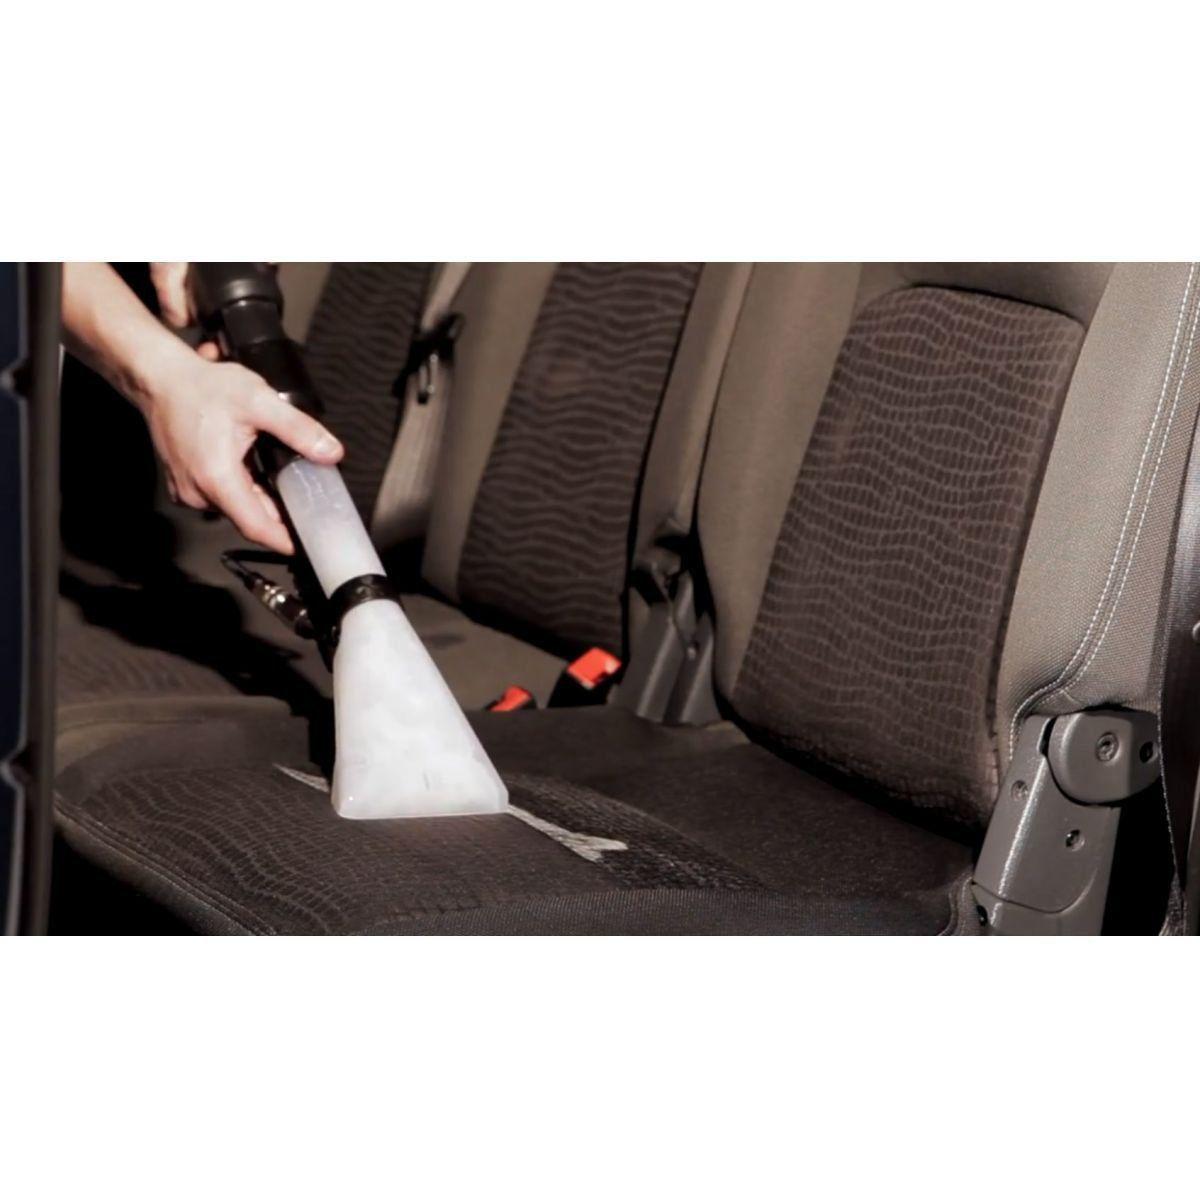 Bico Limpeza de Estofados Zip SB06174 - IPCBrasil  - COLAR